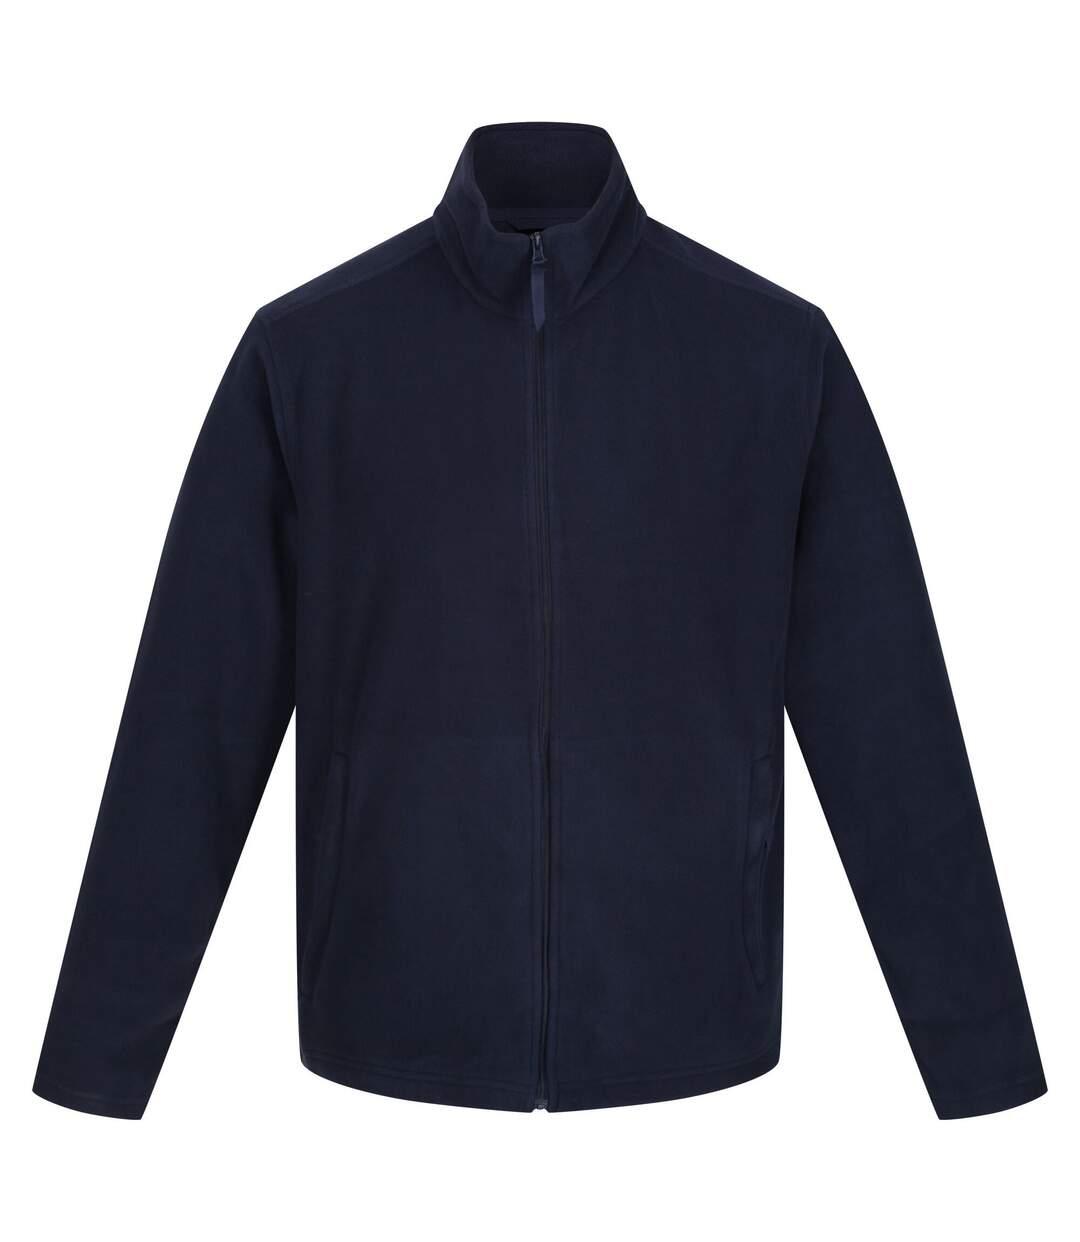 Regatta Mens Classic Microfleece Jacket (Black) - UTRG5202